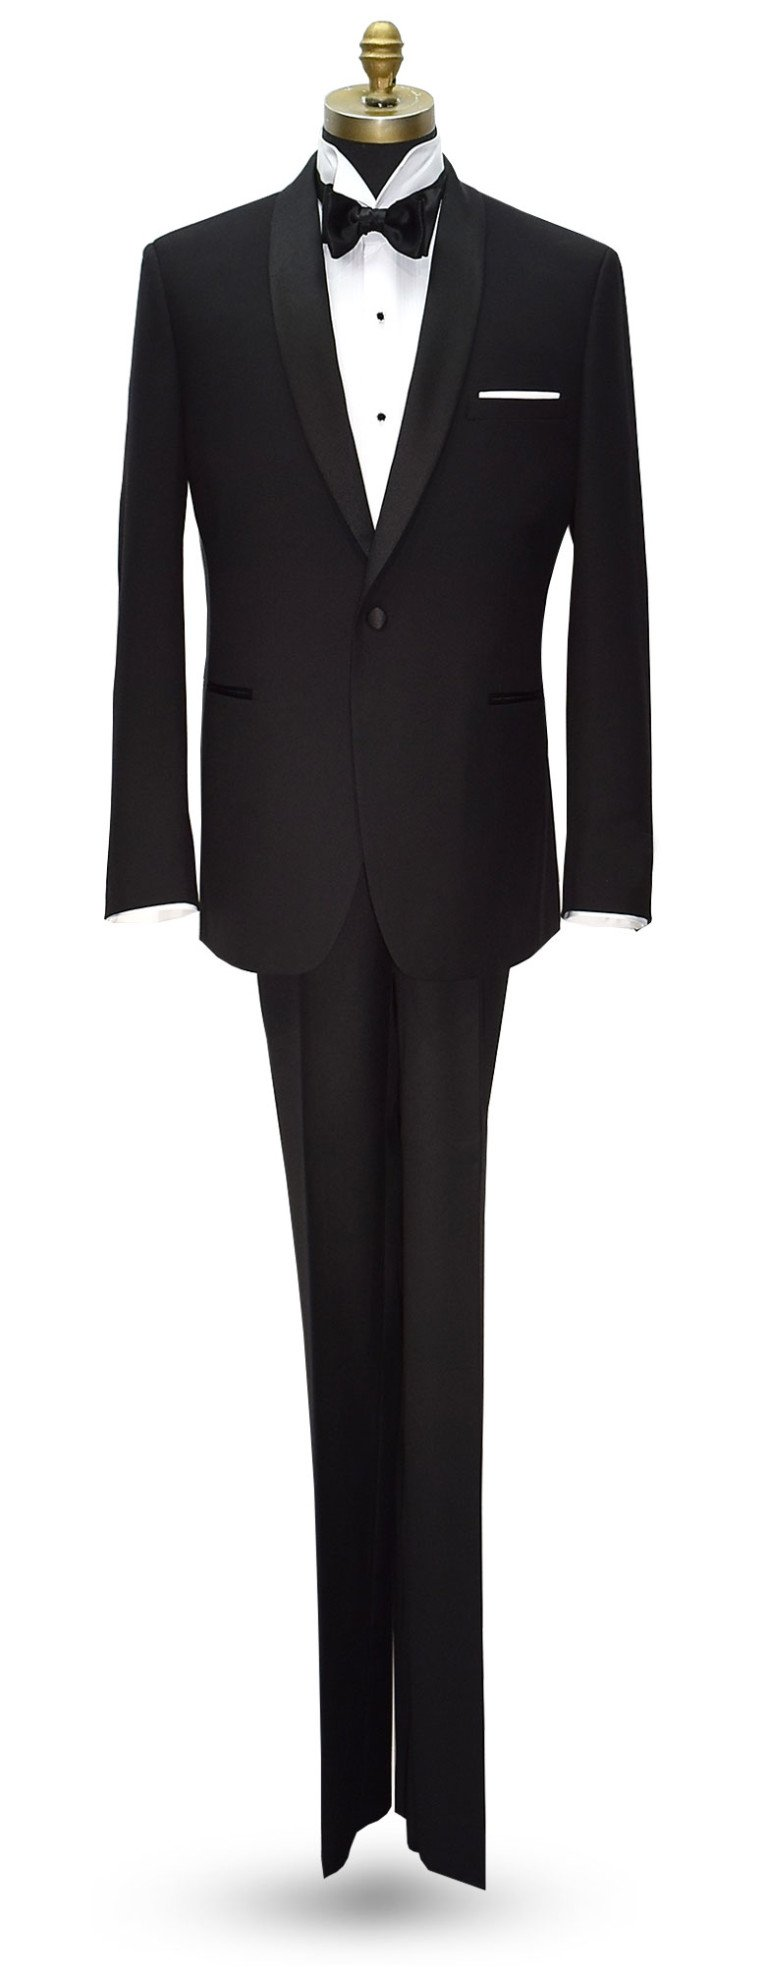 san diego wedding tuxedo rentals and sales